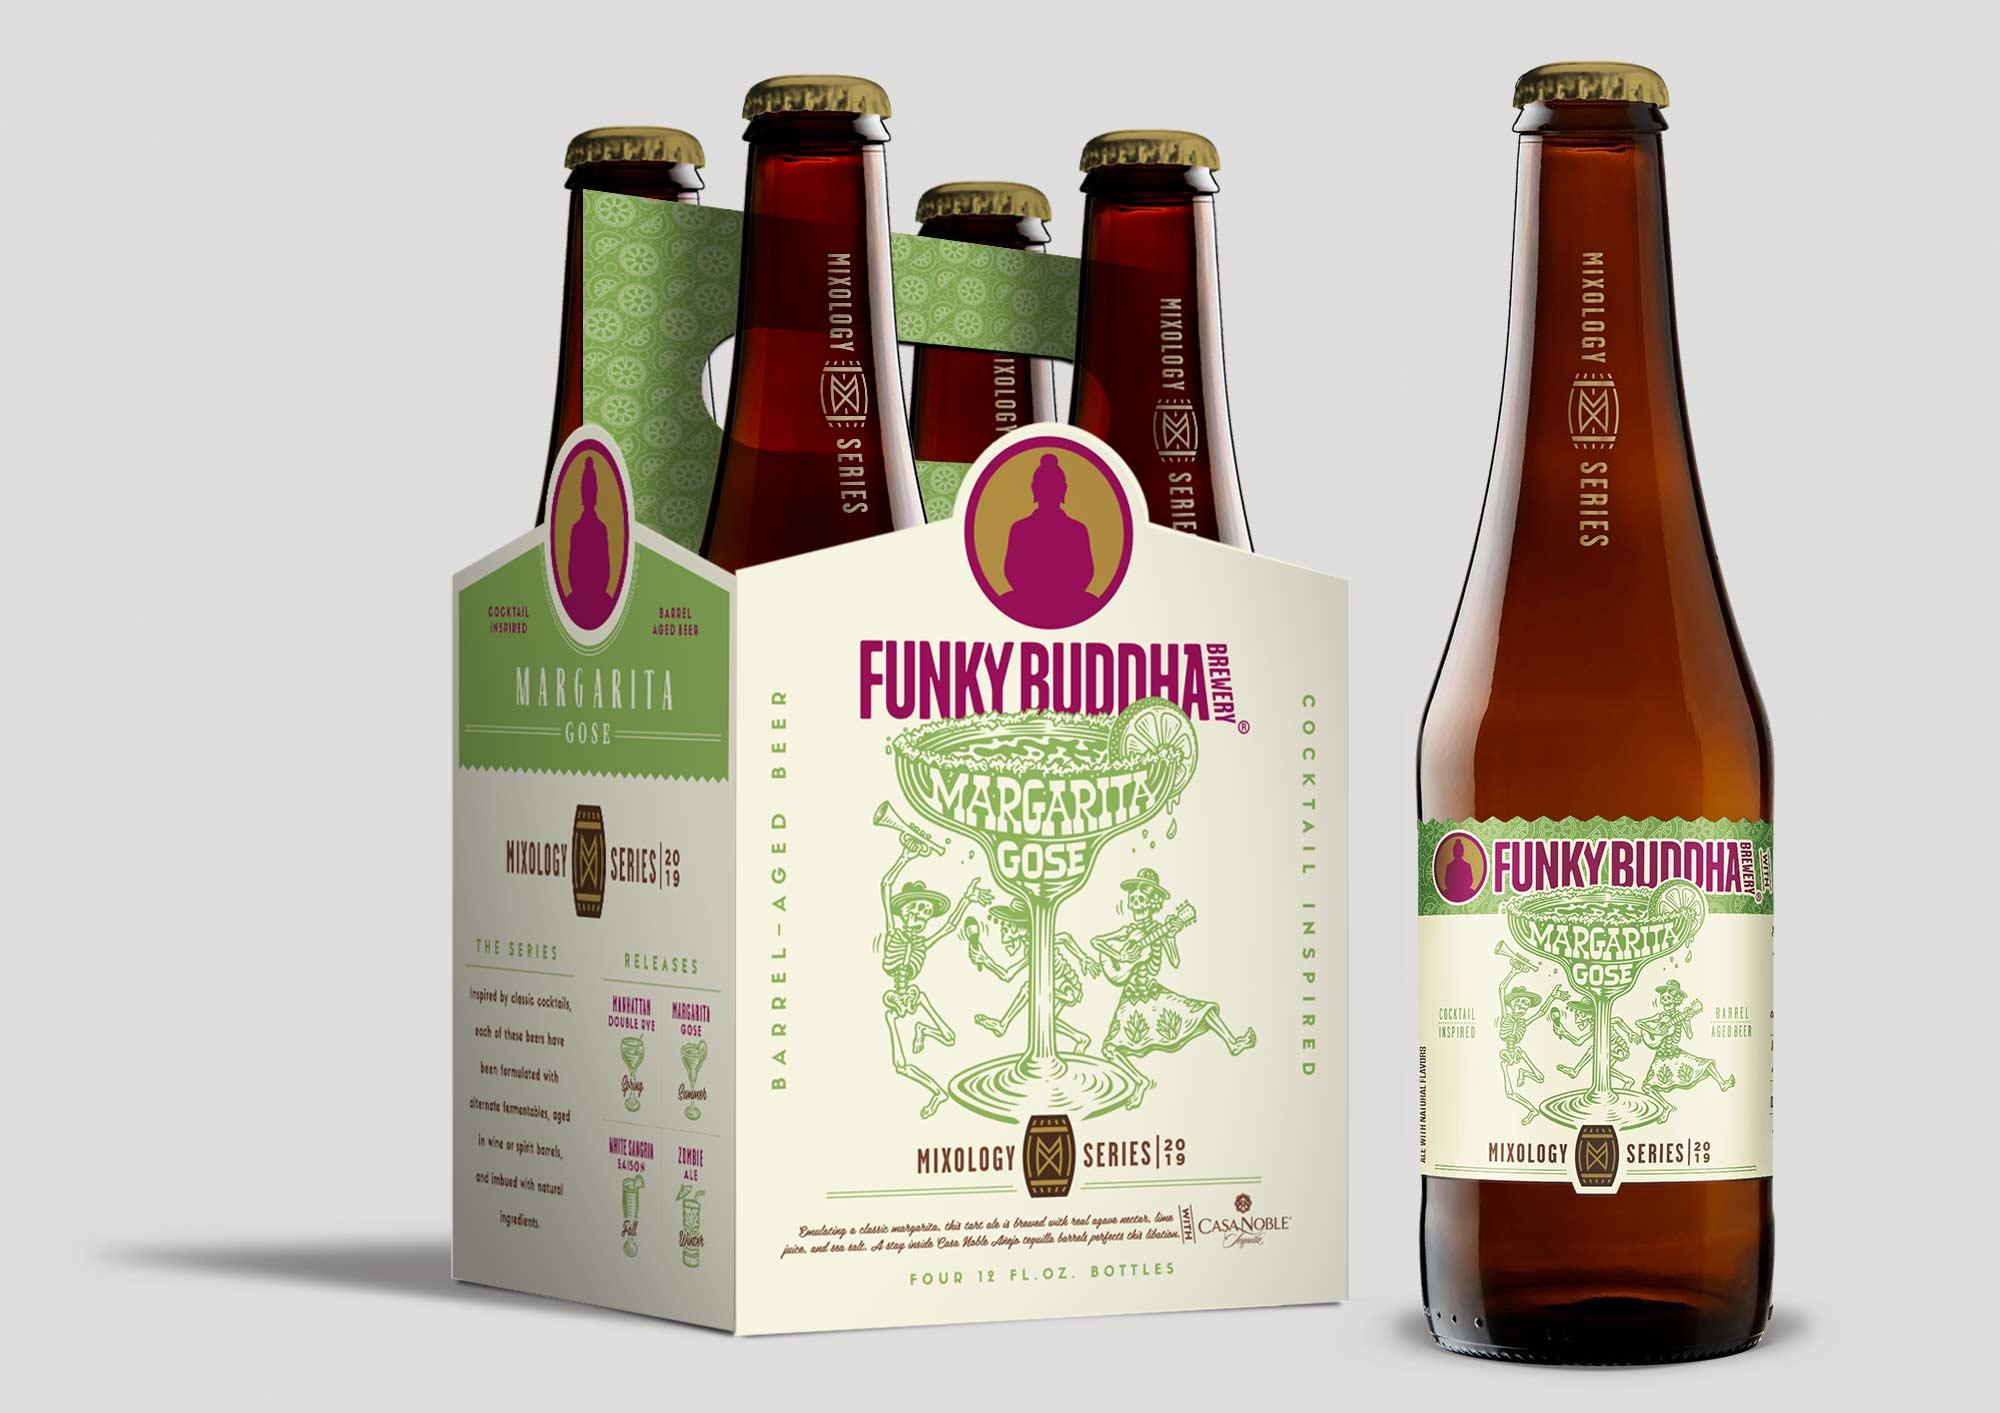 Funky Buddha Brewery Mixology Series Margarita Gose label design and illustration.